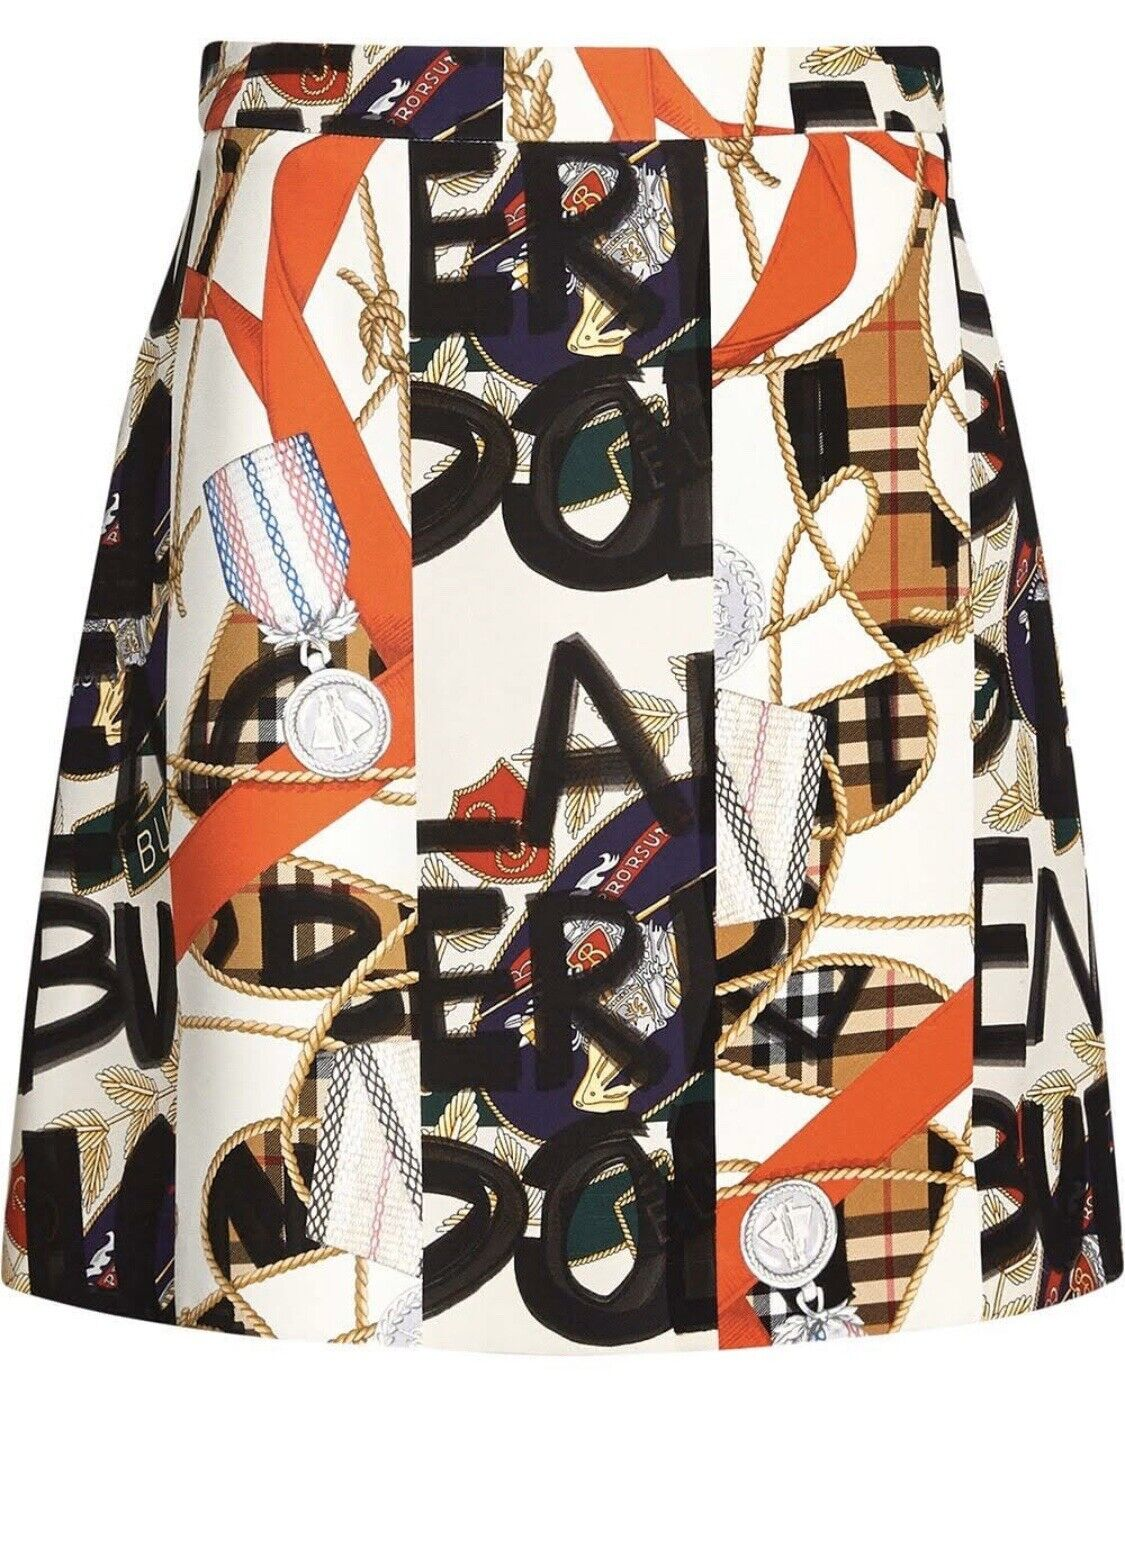 Burberry Mini Skirt with Print Ladies Silk/Wool Size 36 RRP 690